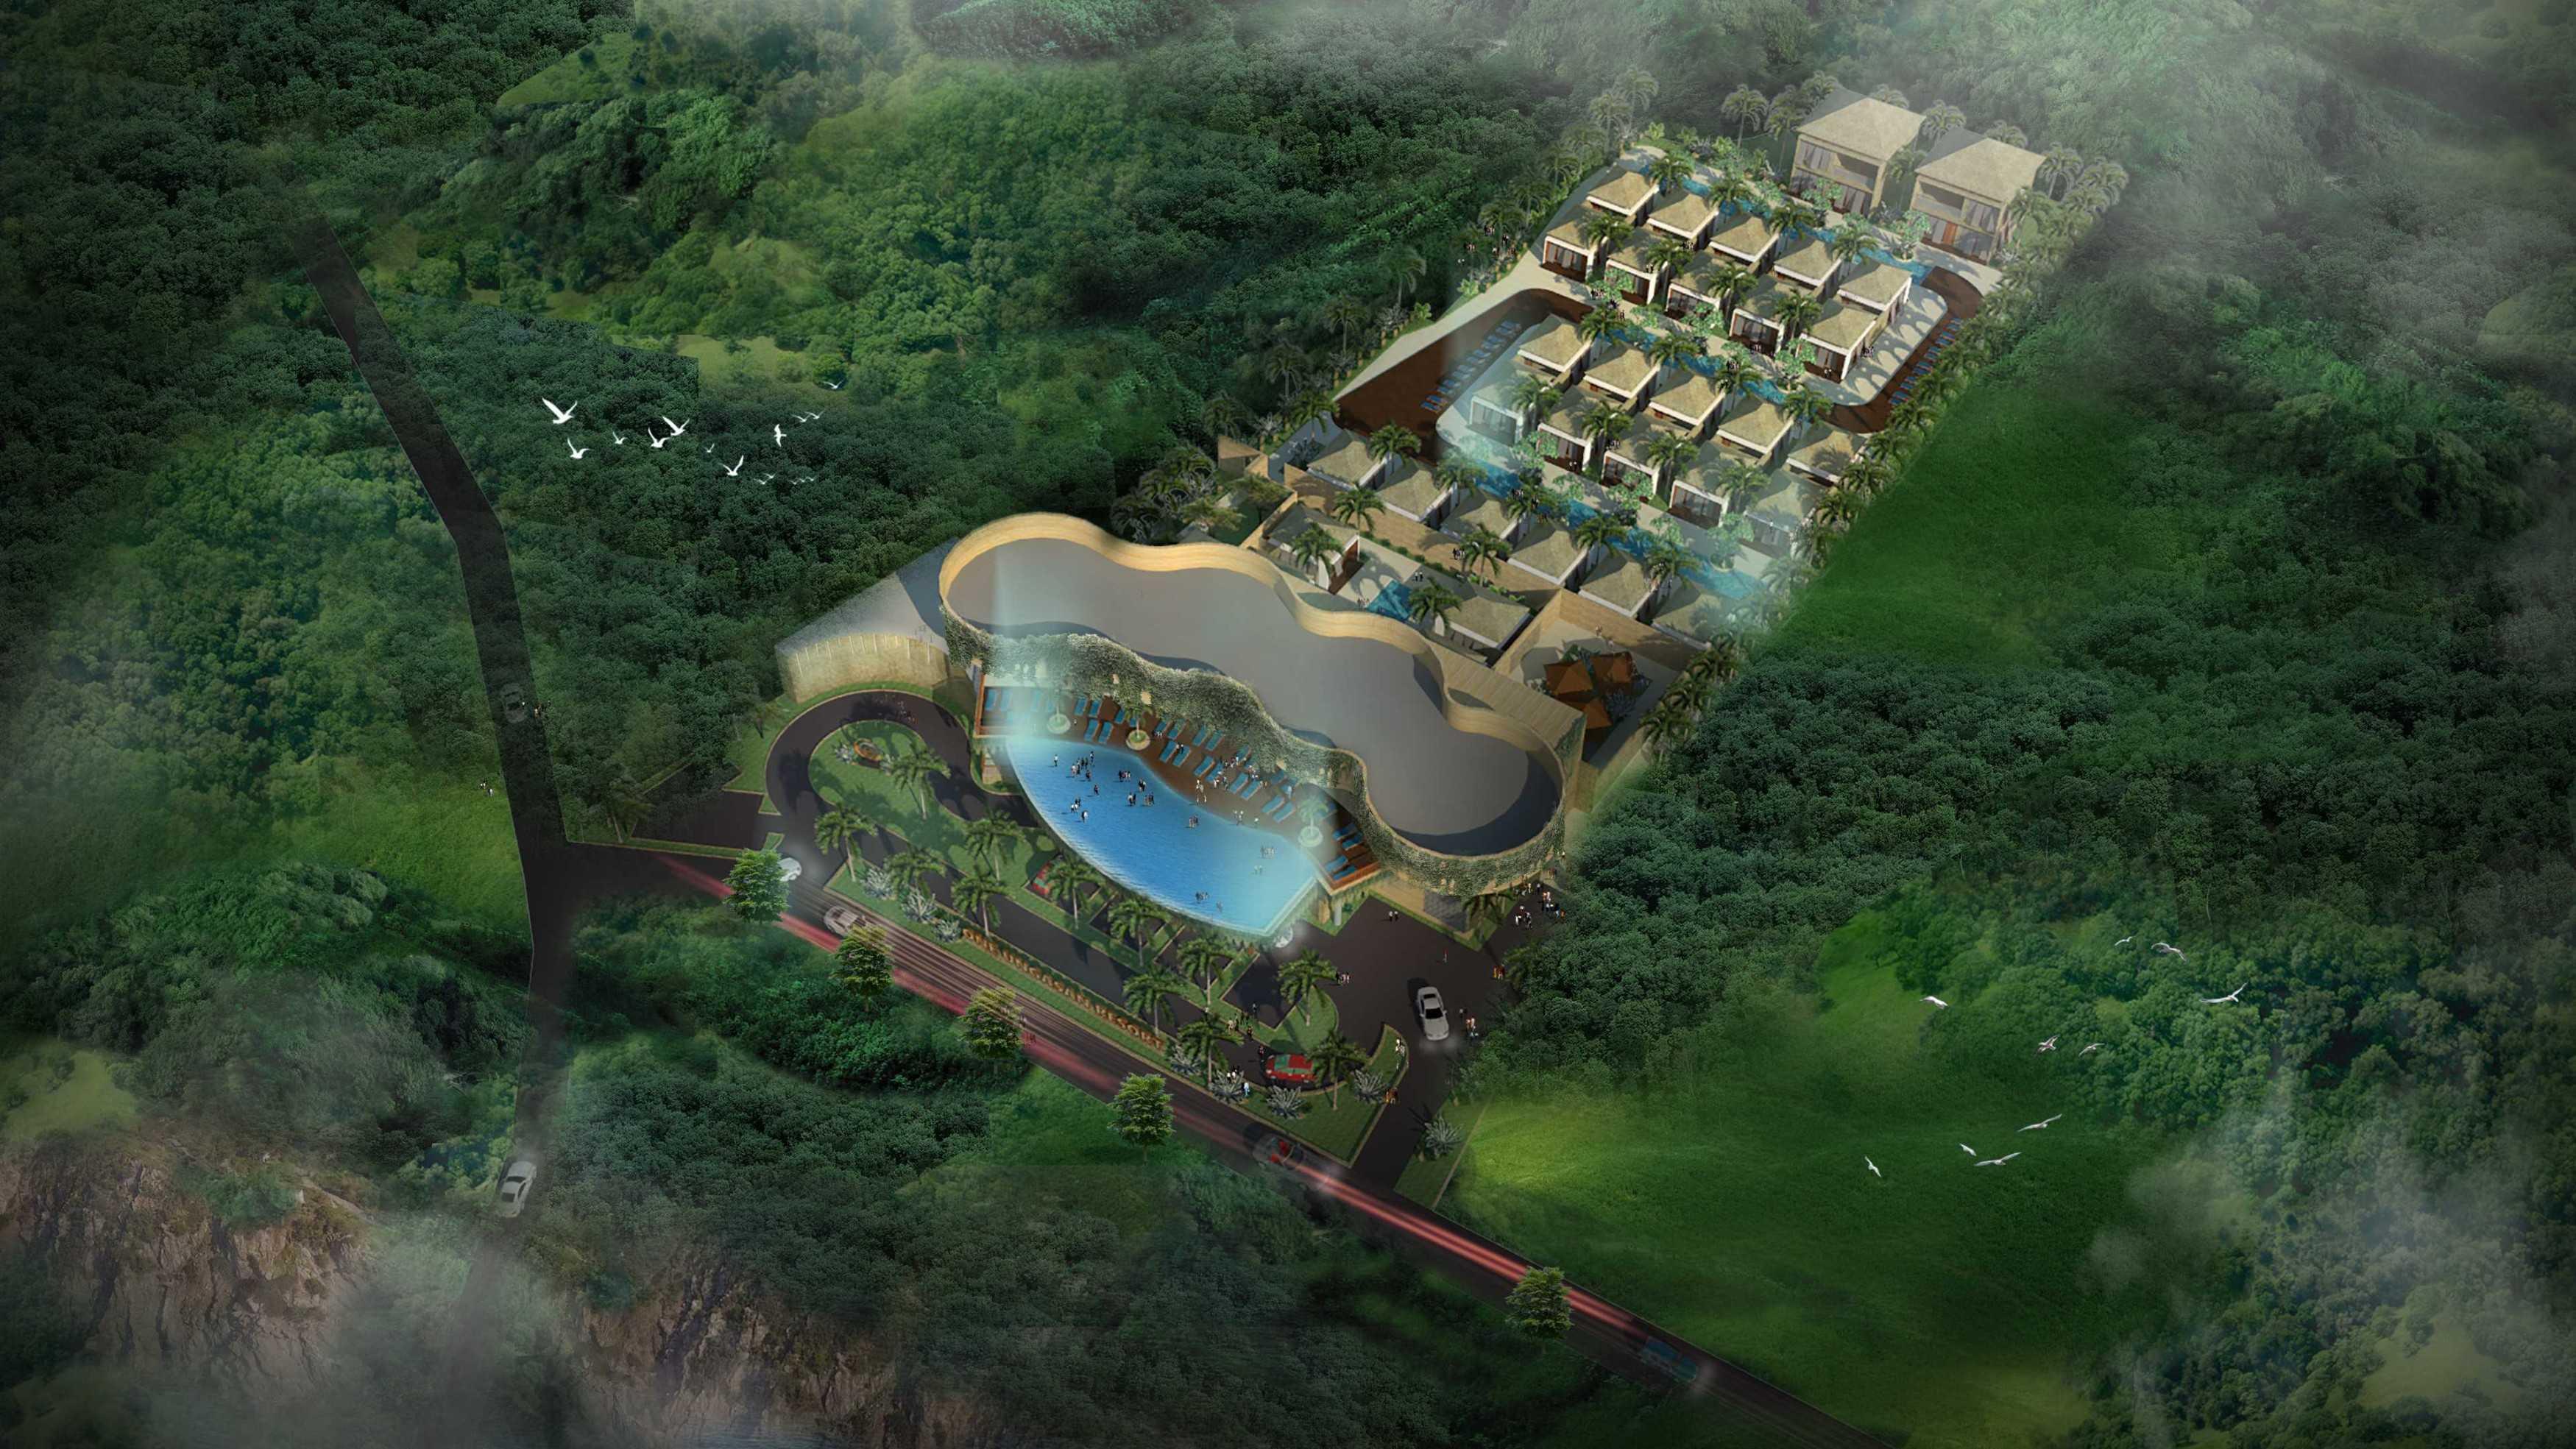 Alima Studio One Ungasan Resort Ungasan, Kuta Sel., Kabupaten Badung, Bali, Indonesia Ungasan, Kuta Sel., Kabupaten Badung, Bali, Indonesia Alima-Studio-One-Ungasan-Resort   57475